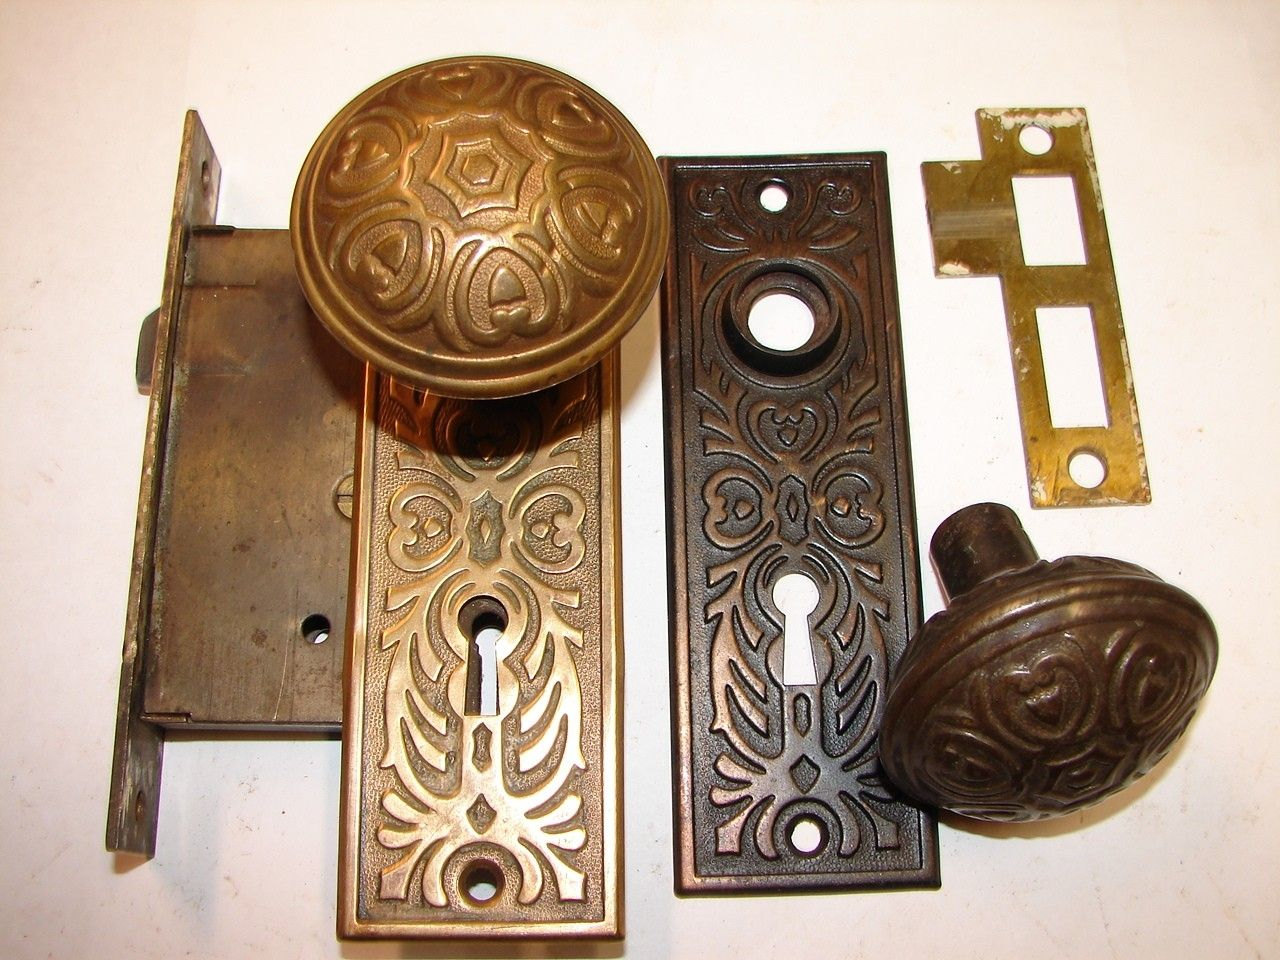 Genial Vintage Door Knobs And Hardware